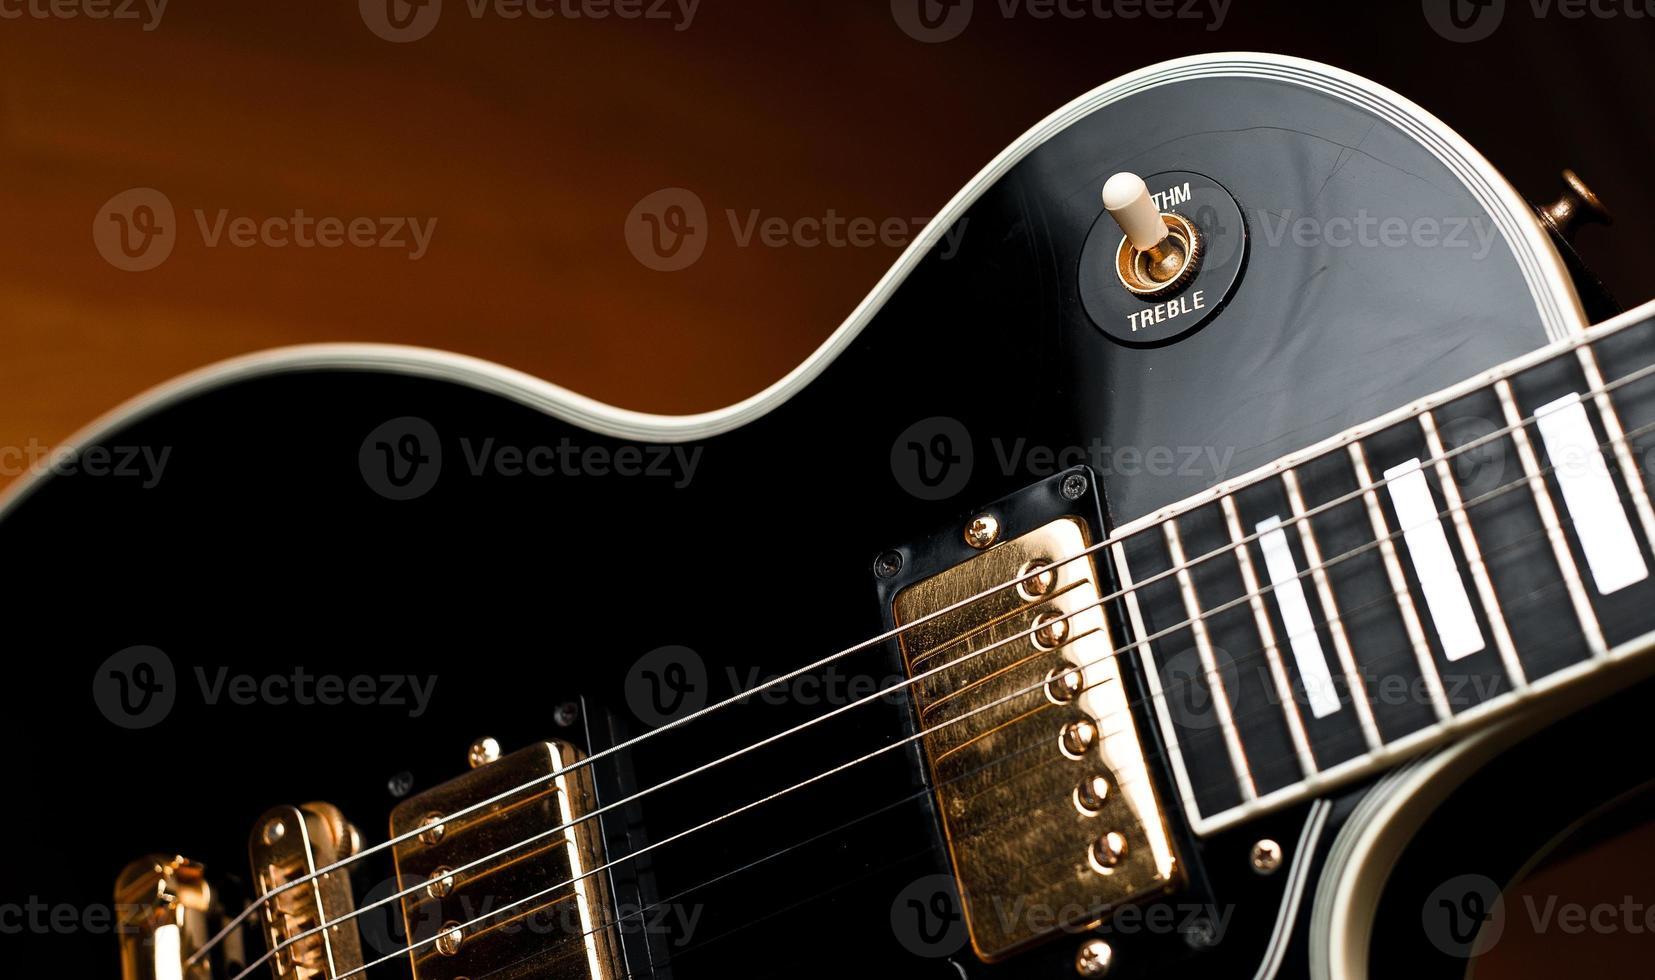 chitarra classica rock and roll. foto